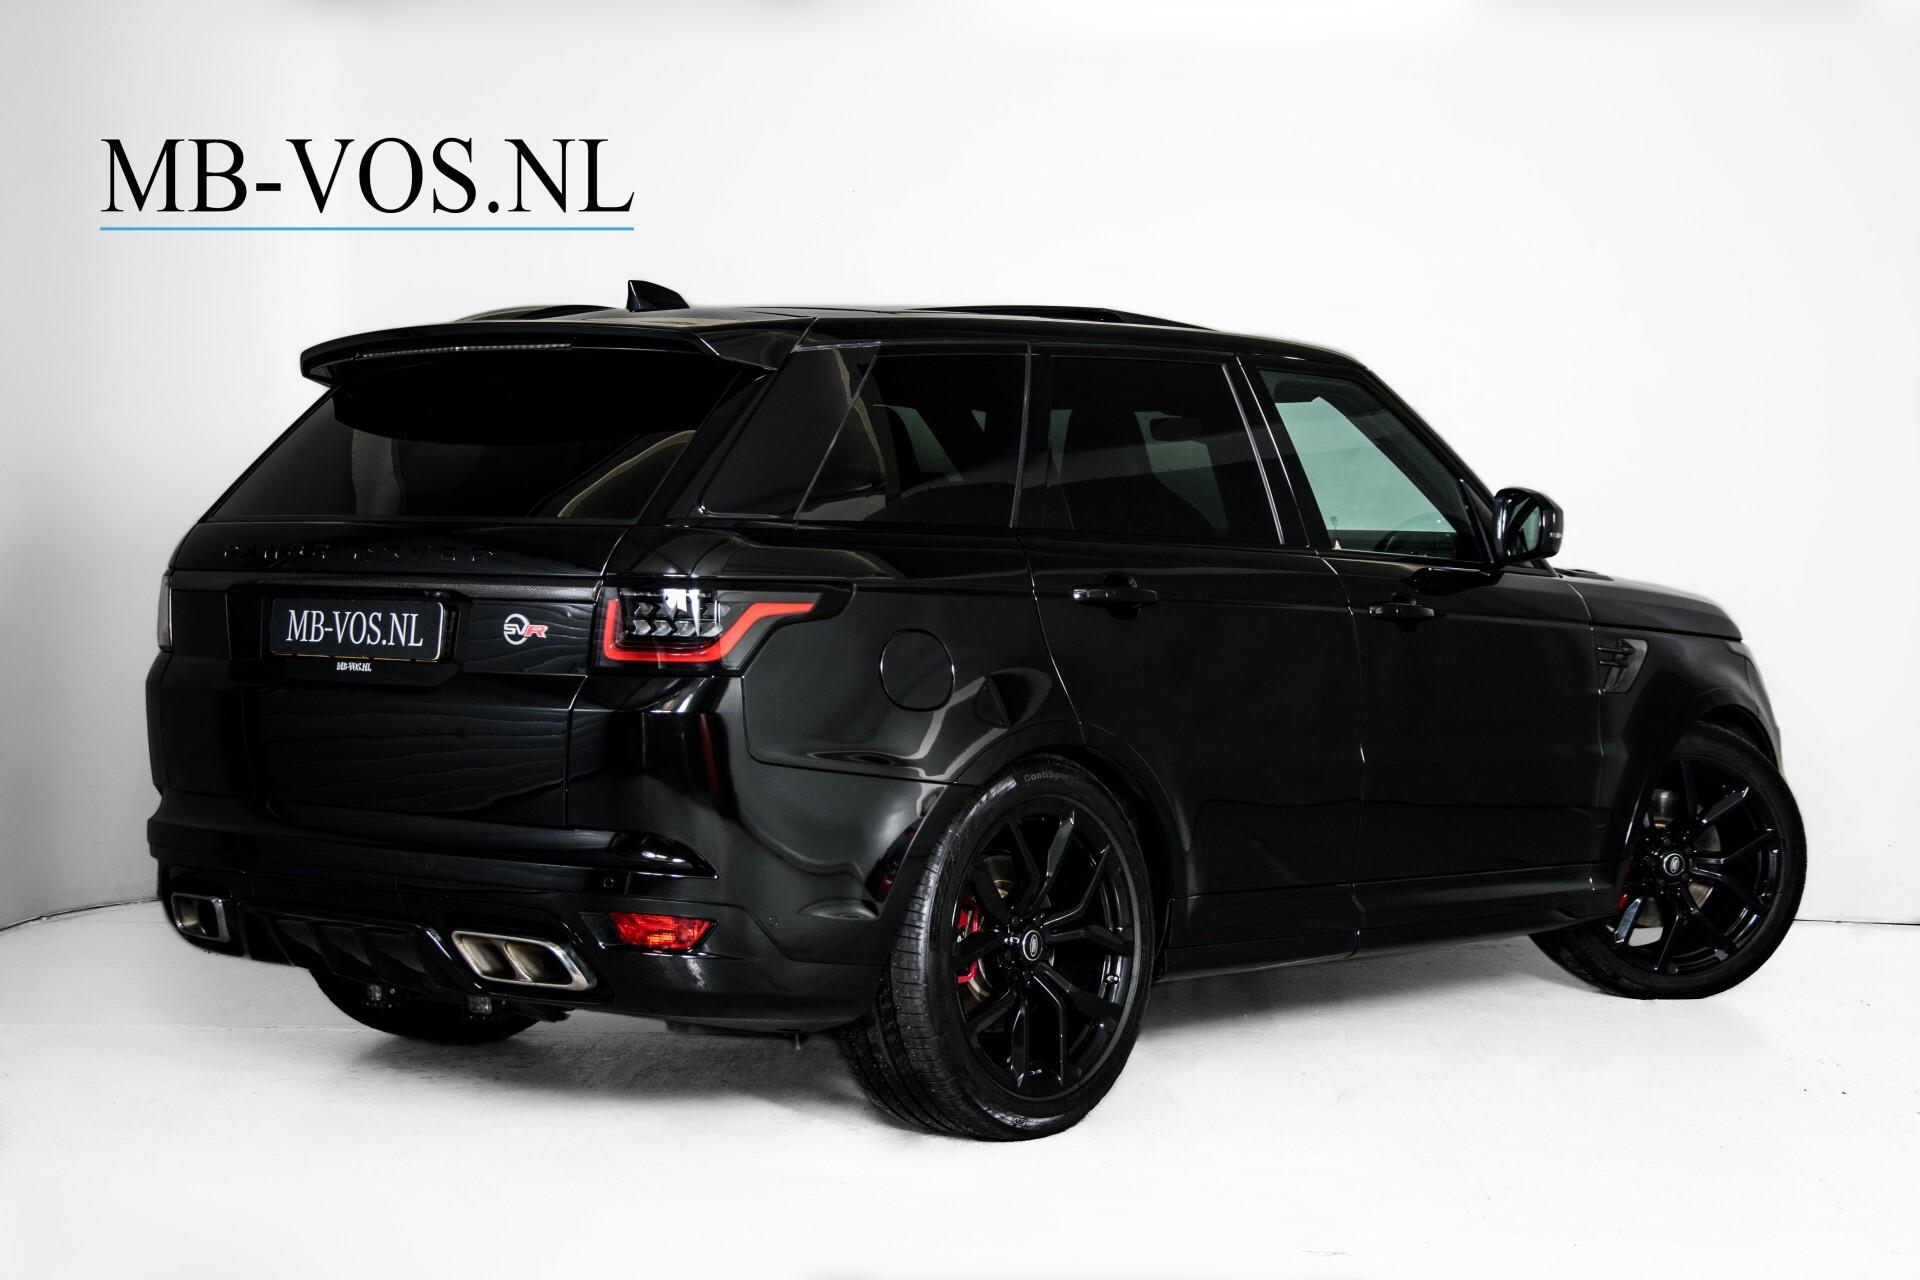 Land Rover Range Rover Sport SVR 5.0 Supercharged 575pk Full Carbon Nieuwprijs €241377 Foto 2